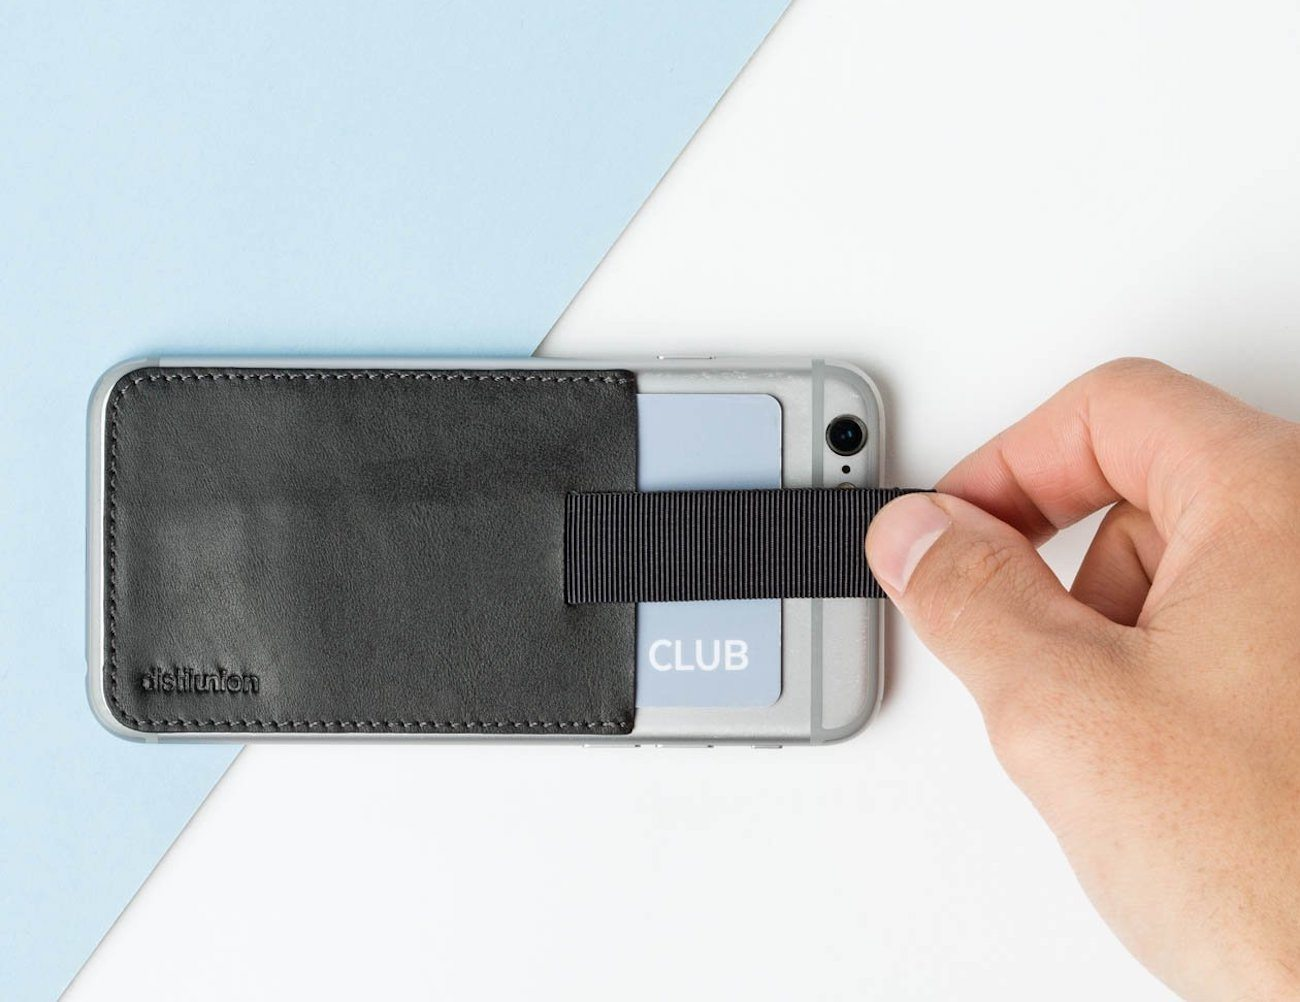 Slim+Smartphone+Card+Holder